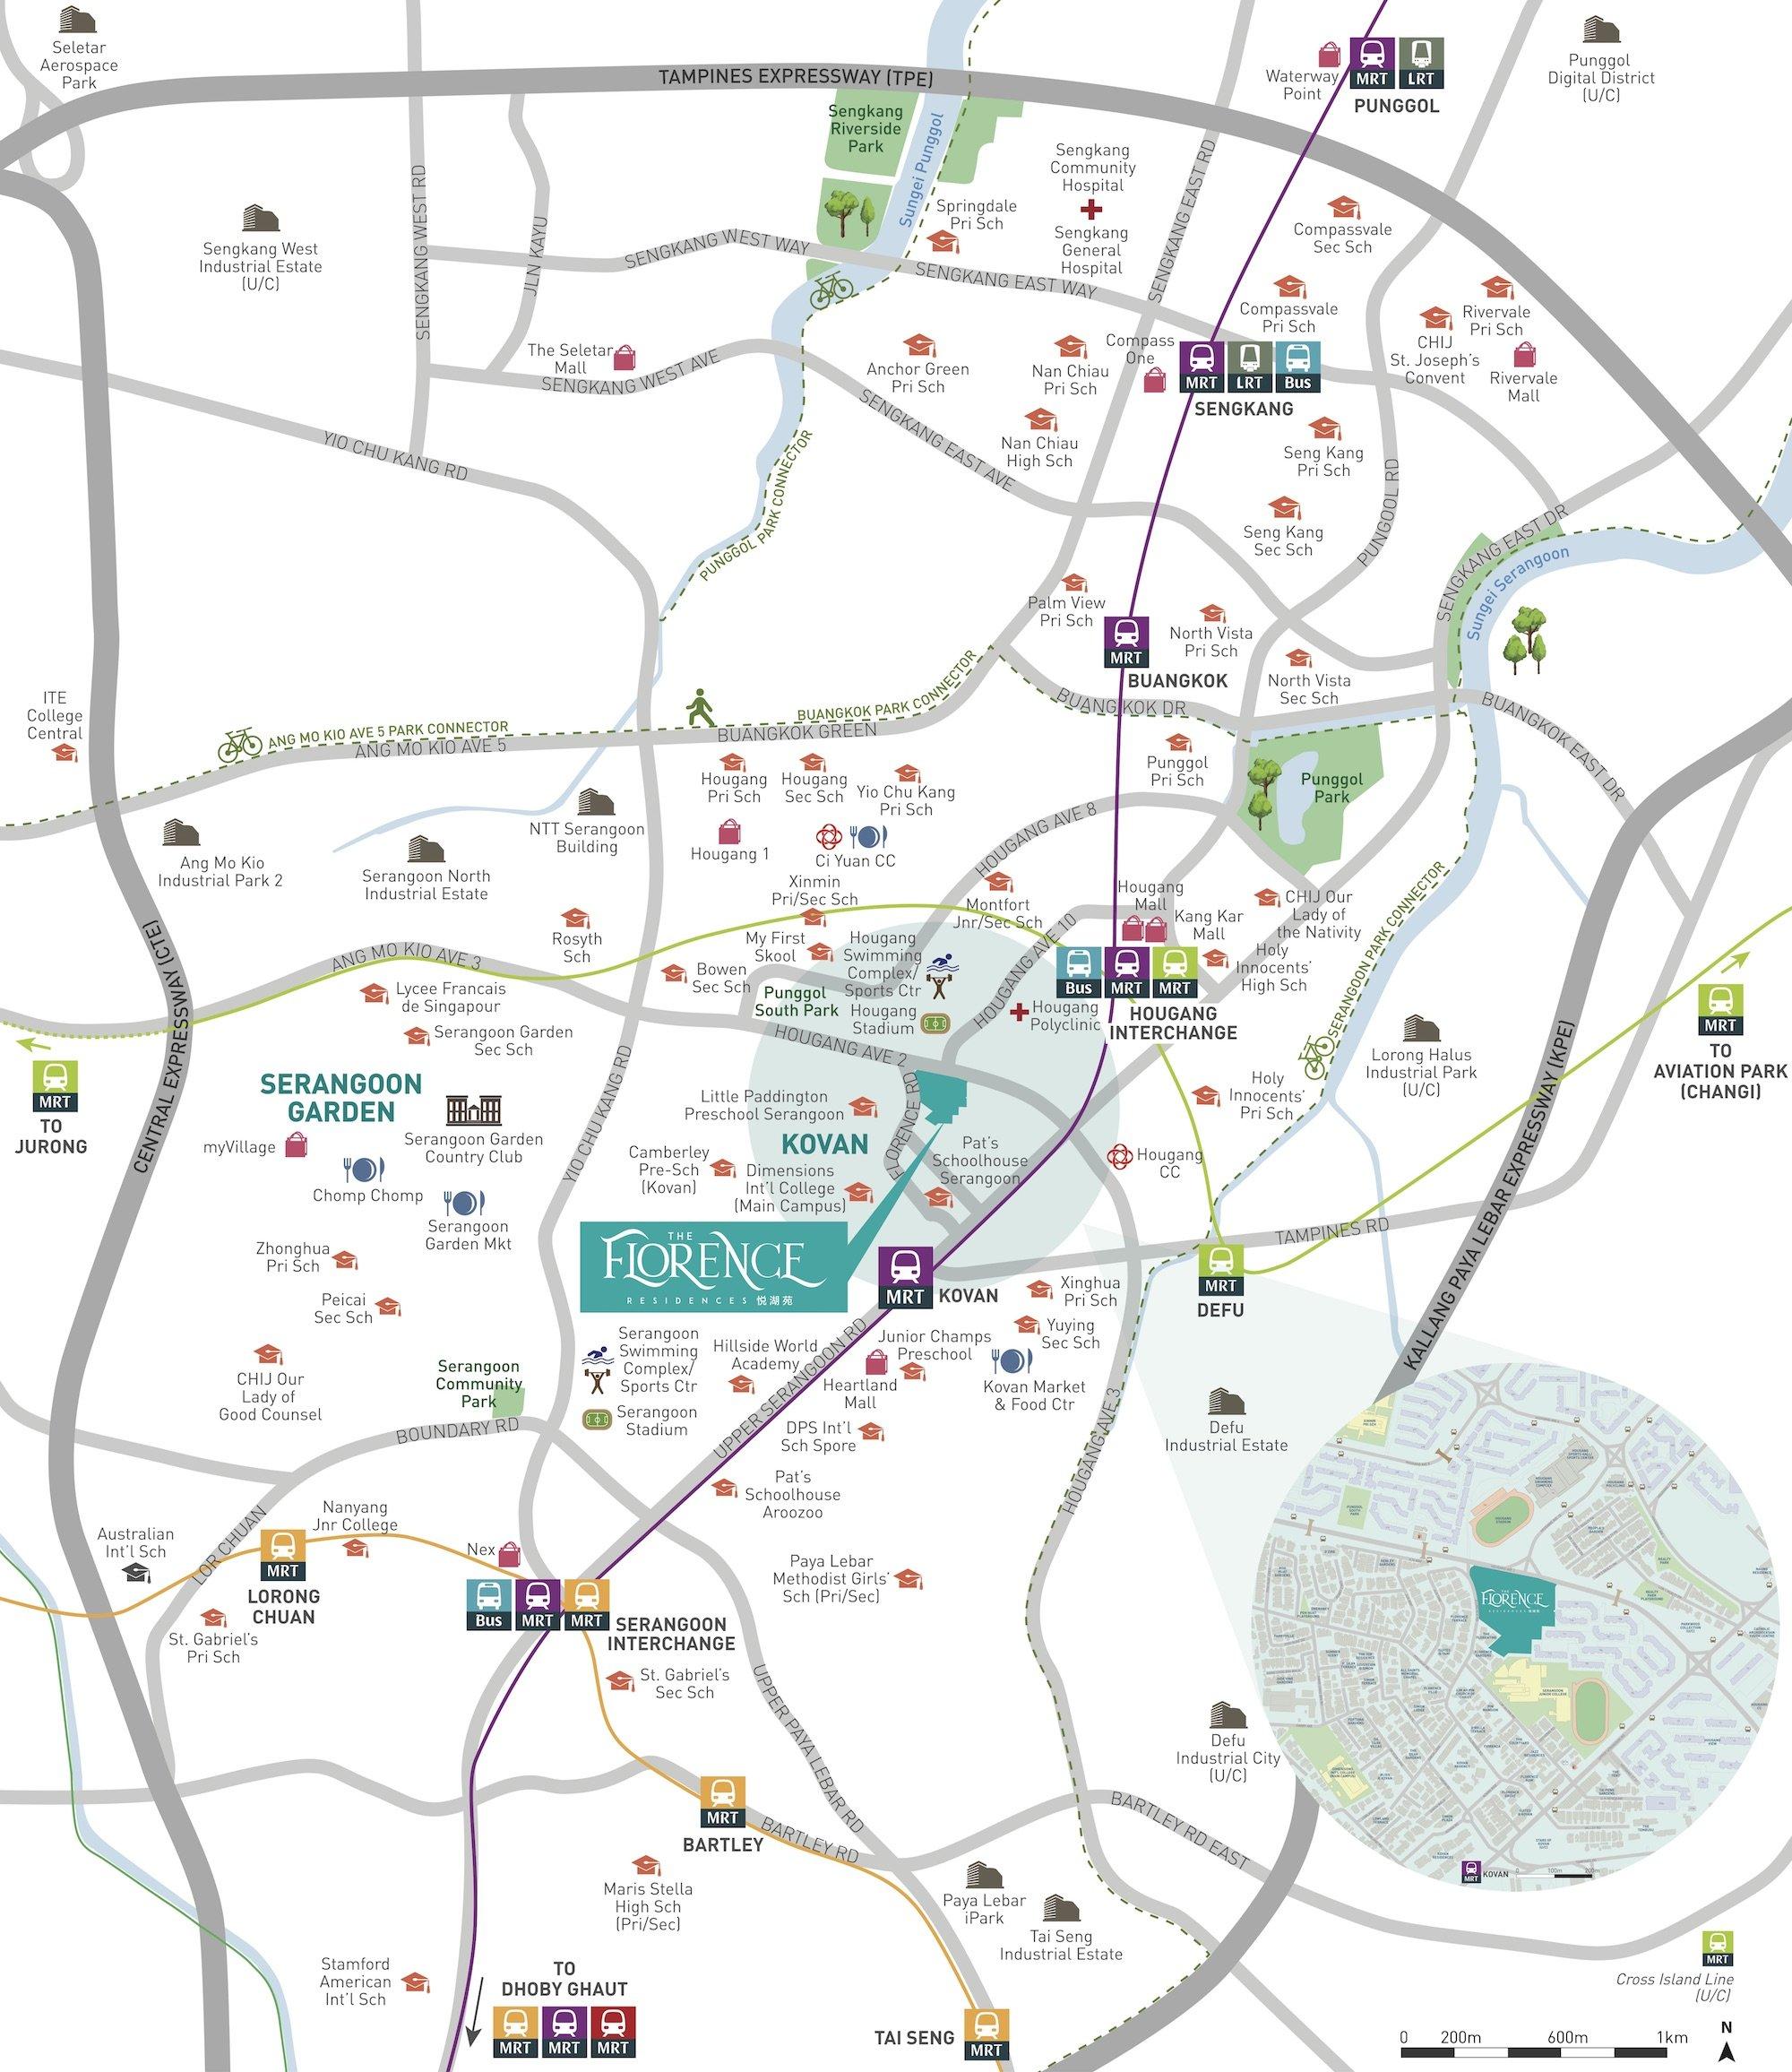 The Florence Residences 悦湖苑 地理位置 location map